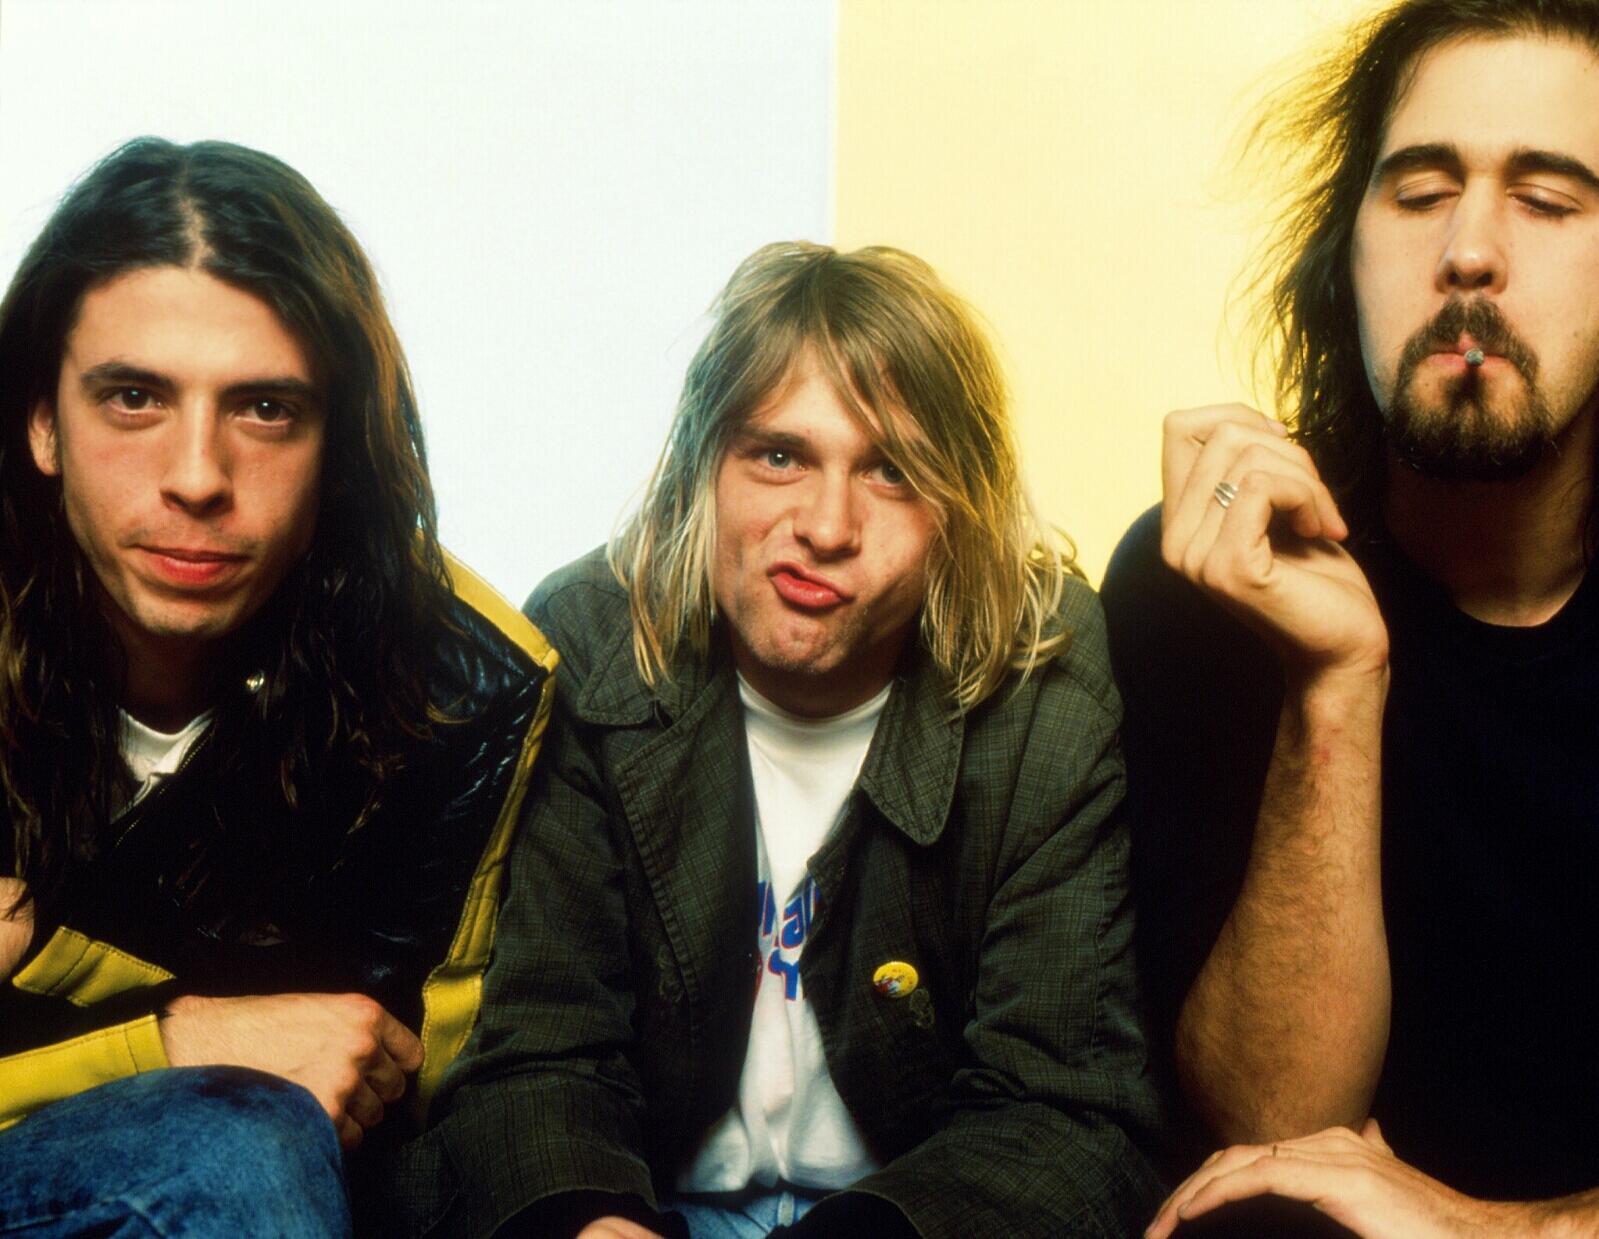 #Nirvana http://t.co/oMktgxlBLv